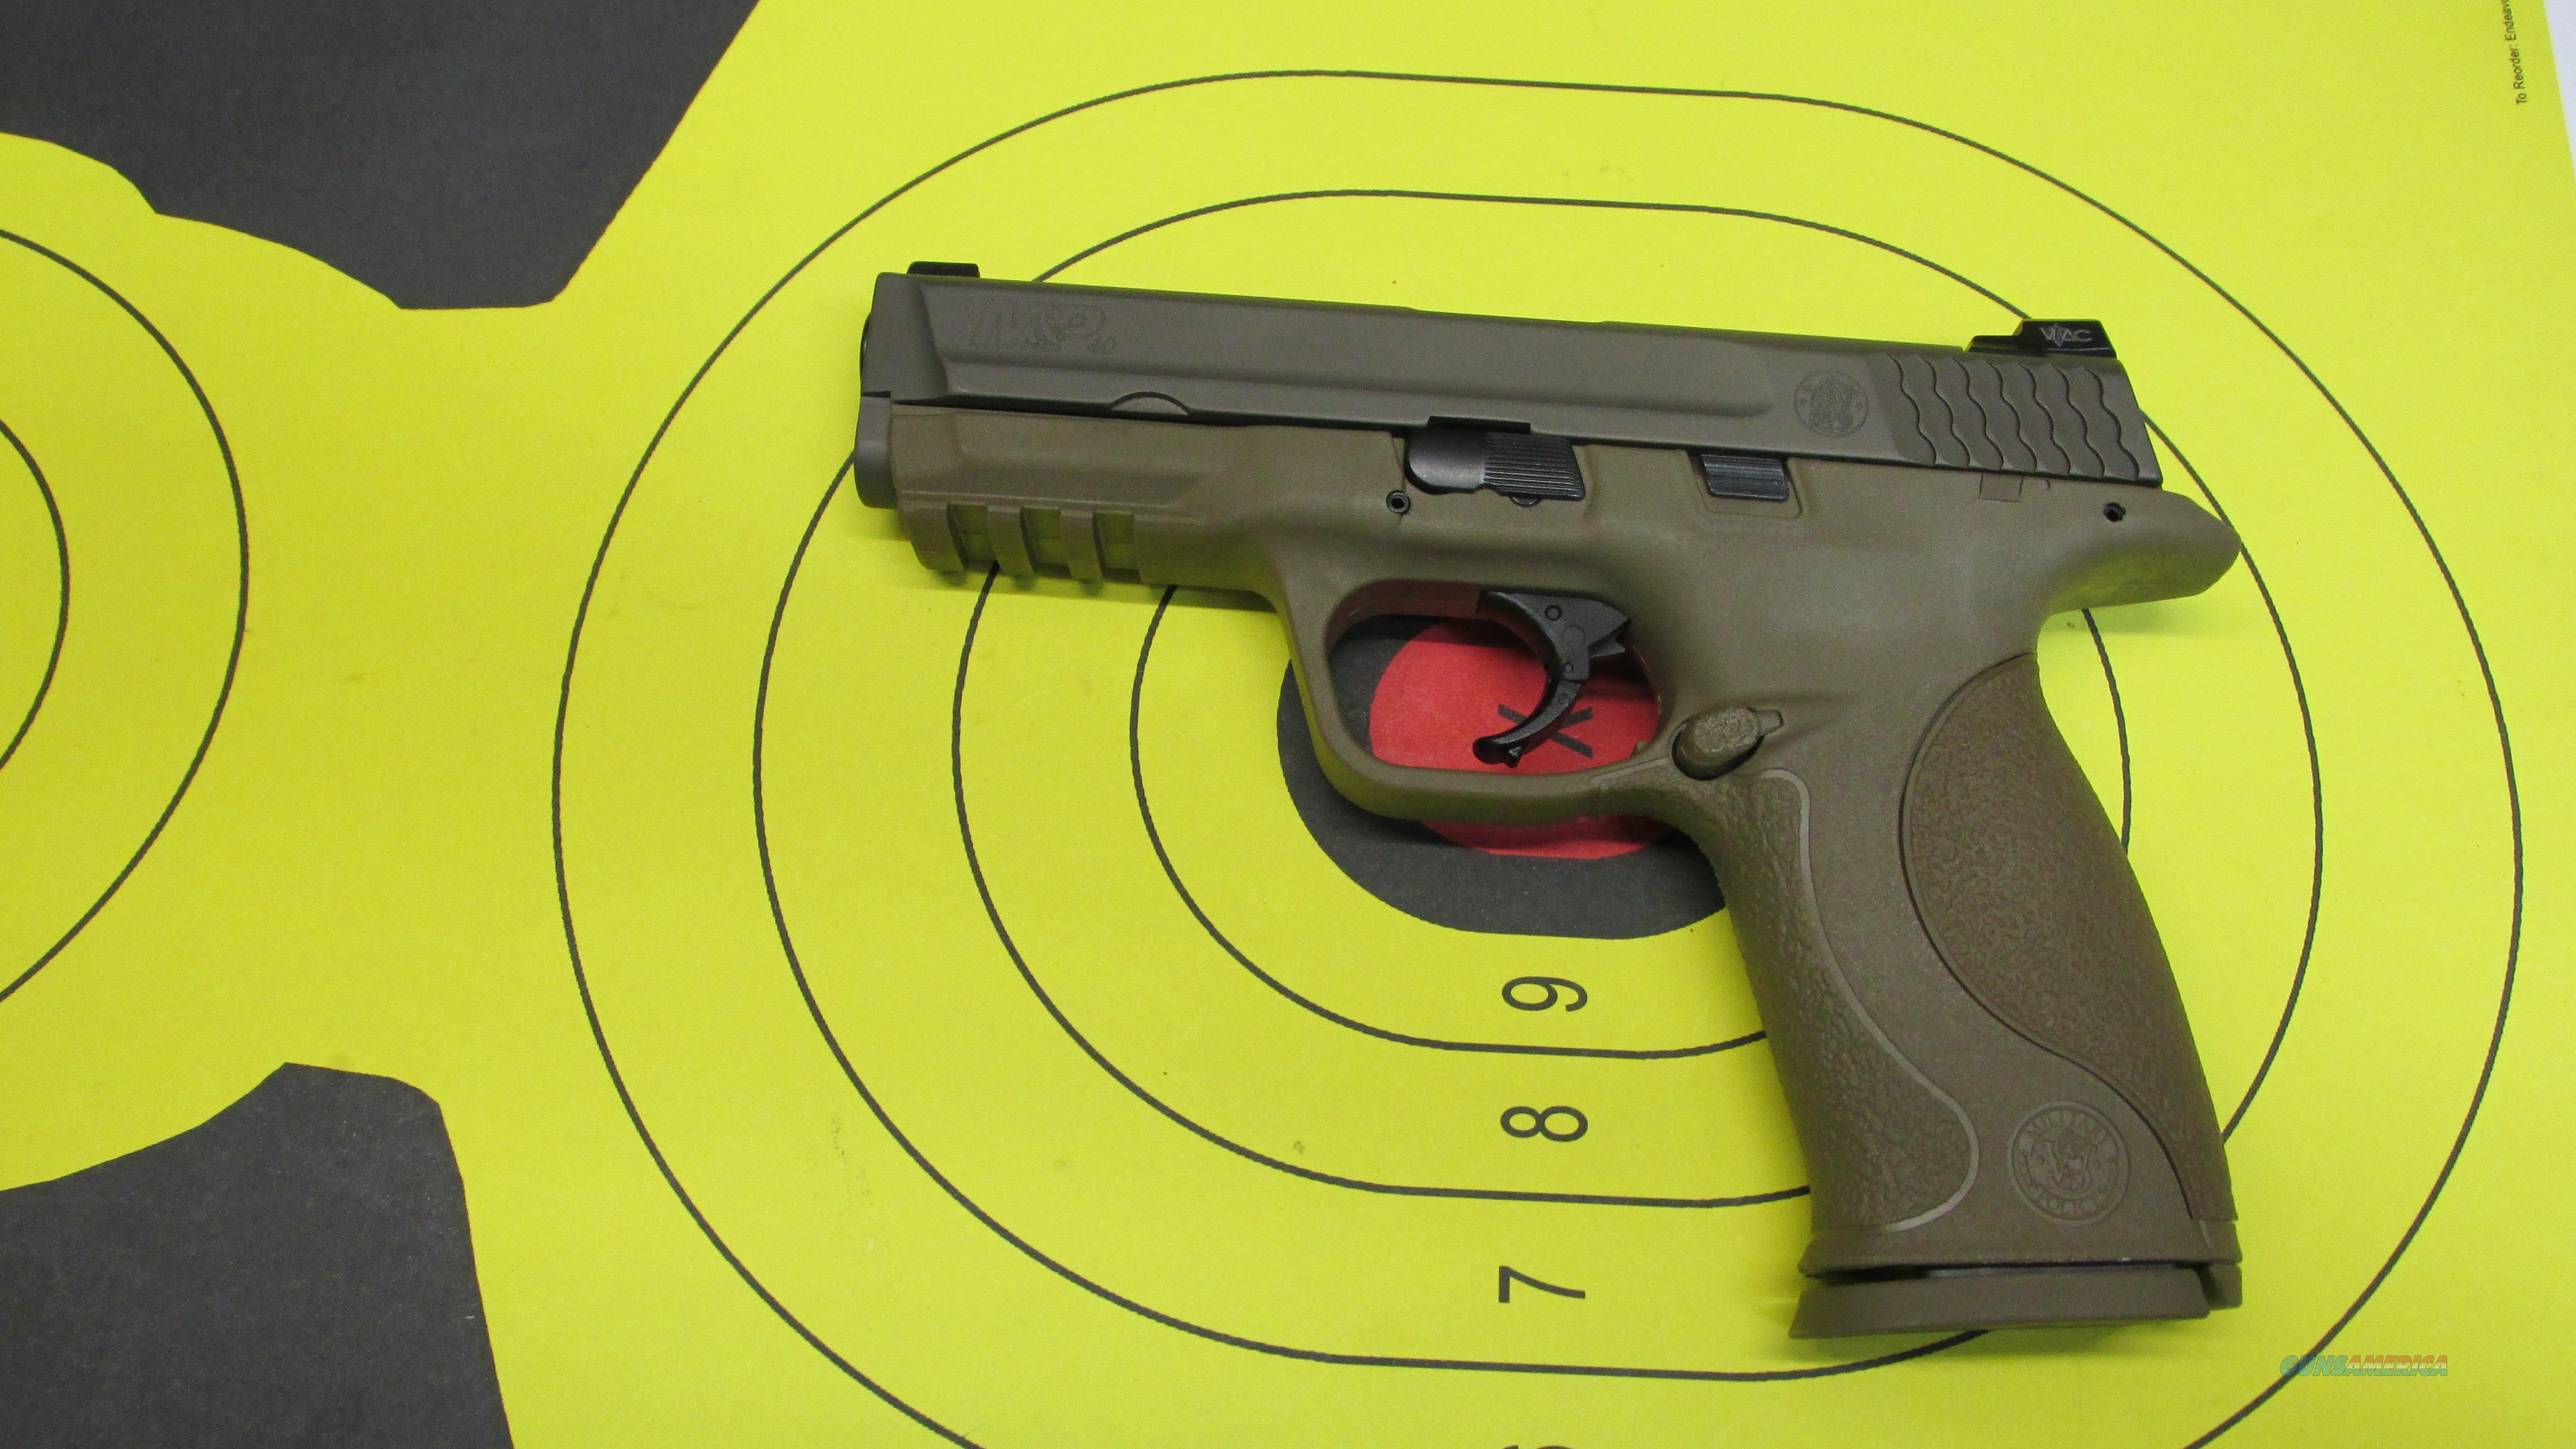 "SMITH & WESSON M&P40 VTAC, FULL FDE .40 S&W PISTOL, 2 14 ROUND MAGAZINES, 4.25"" BARREL  Guns > Pistols > Smith & Wesson Pistols - Autos > Polymer Frame"